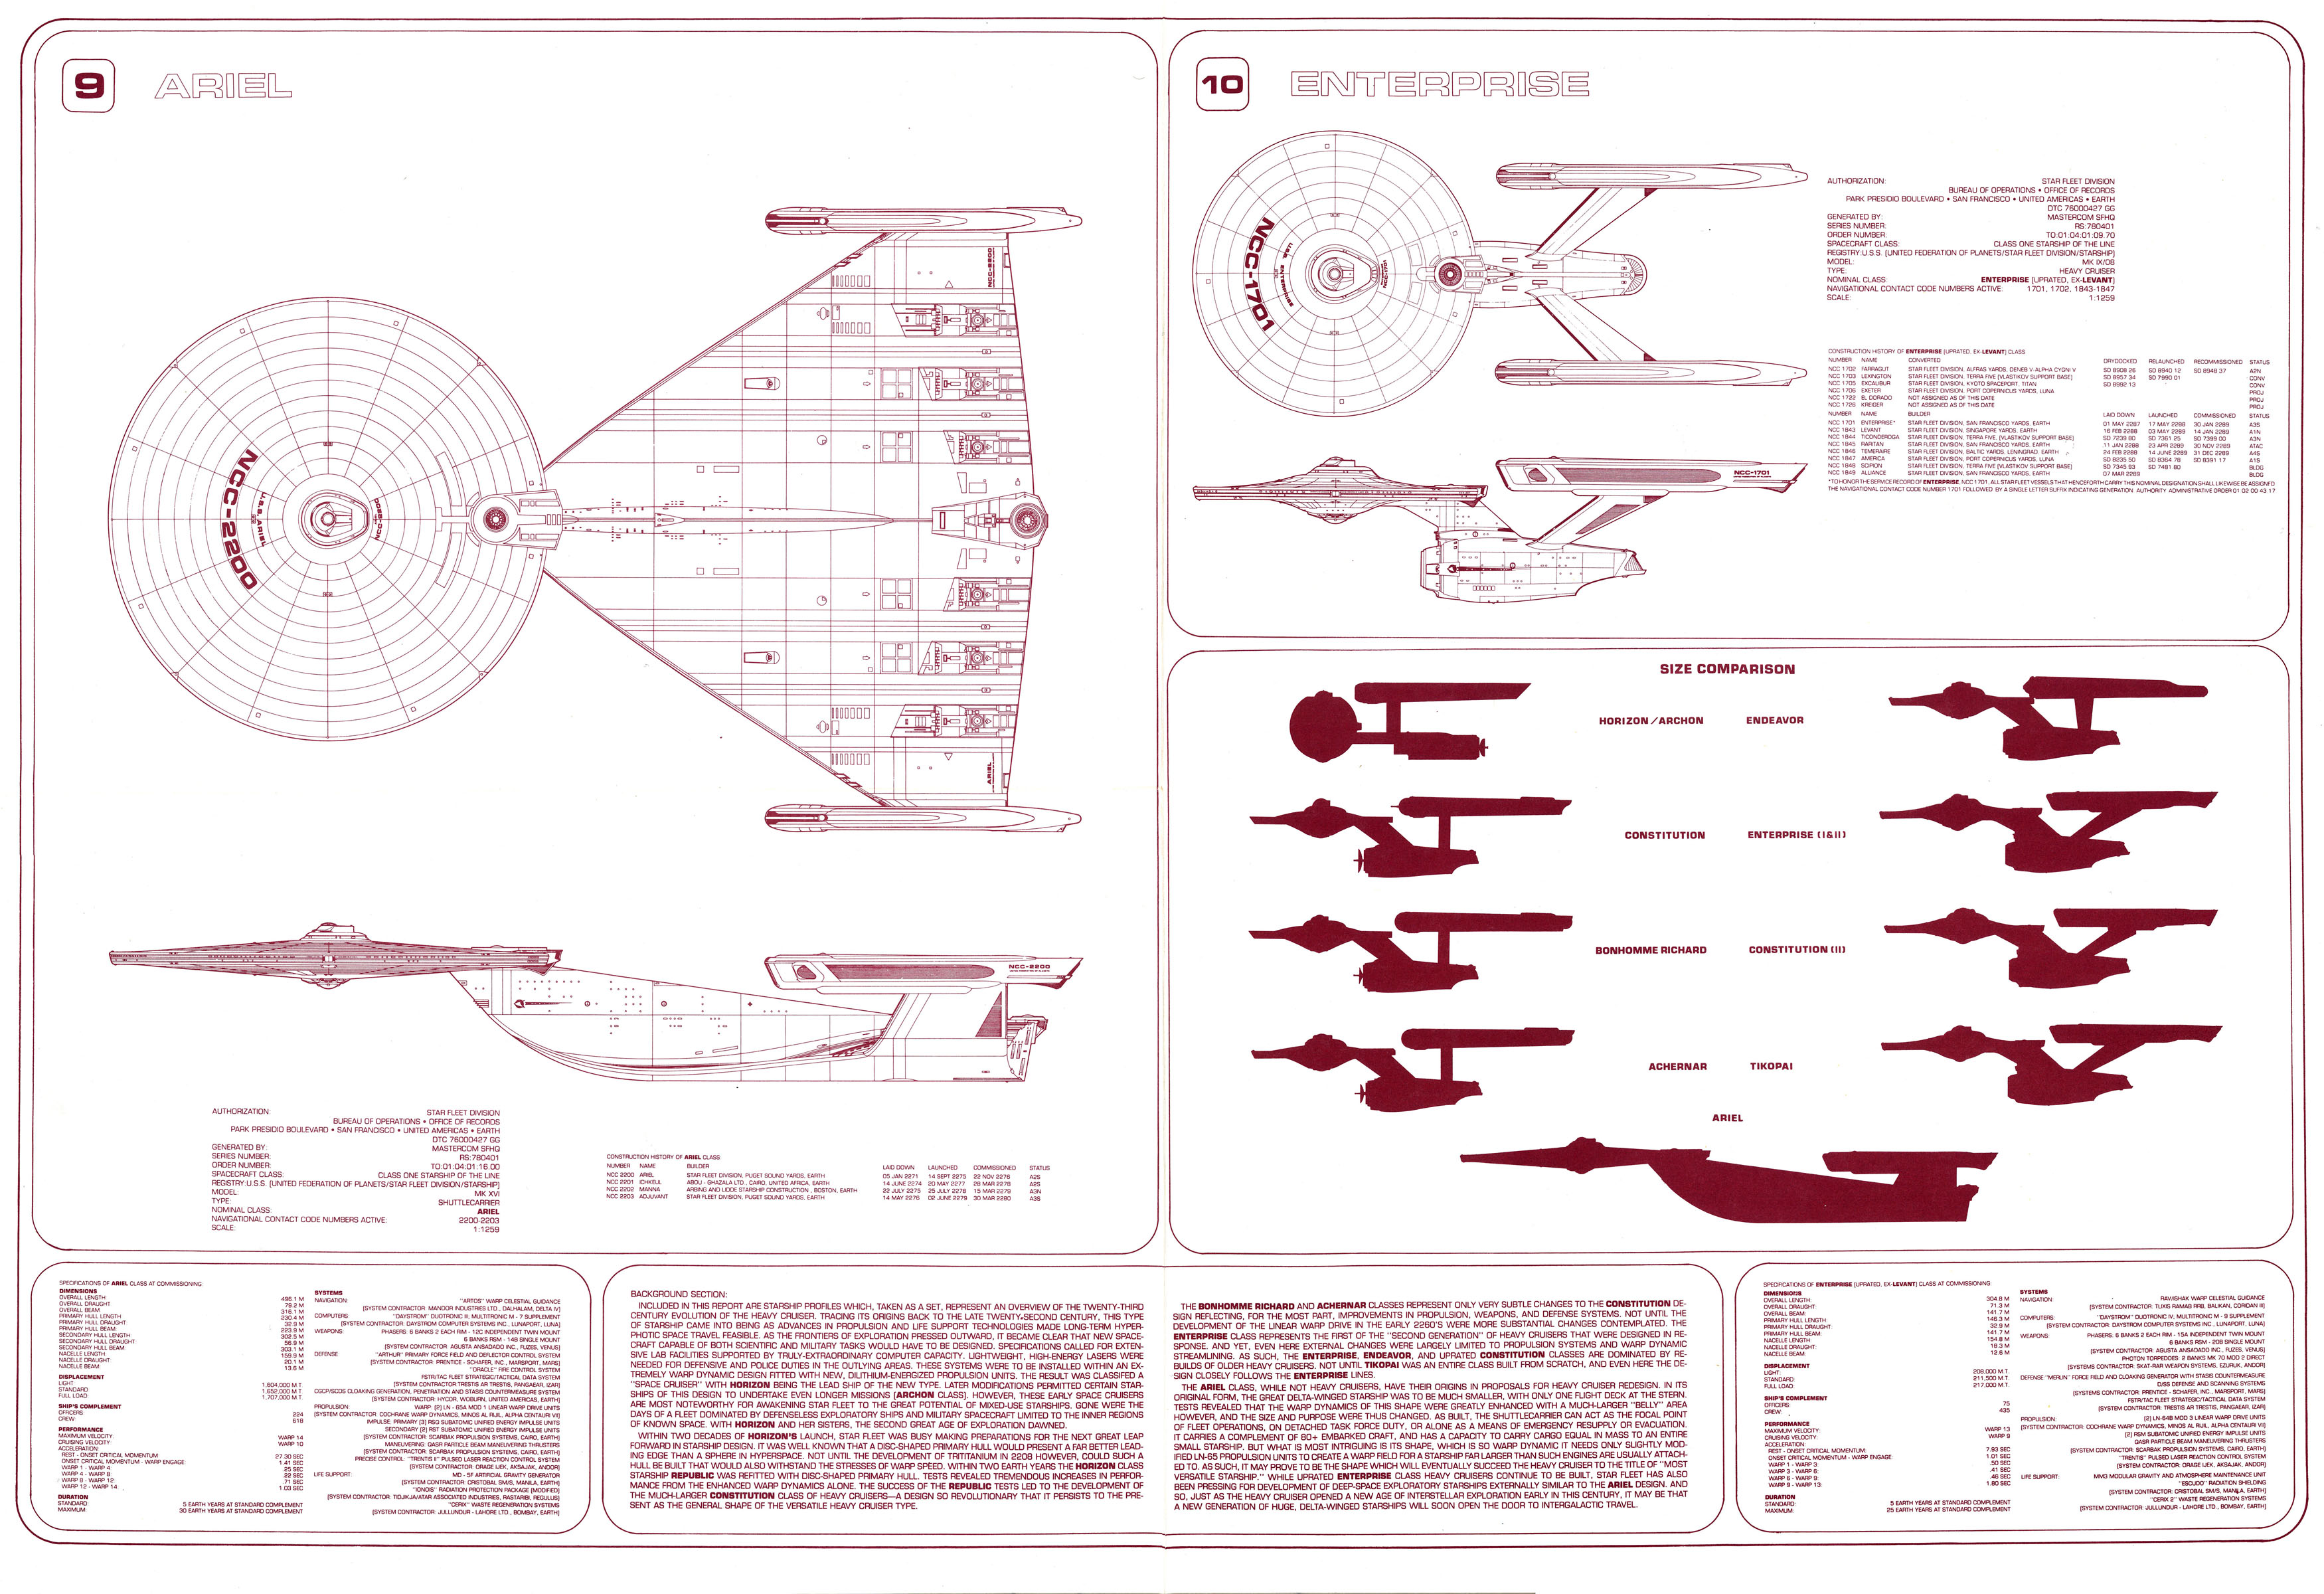 U.S.S. Enterprise Heavy Cruiser Evolution Blueprints